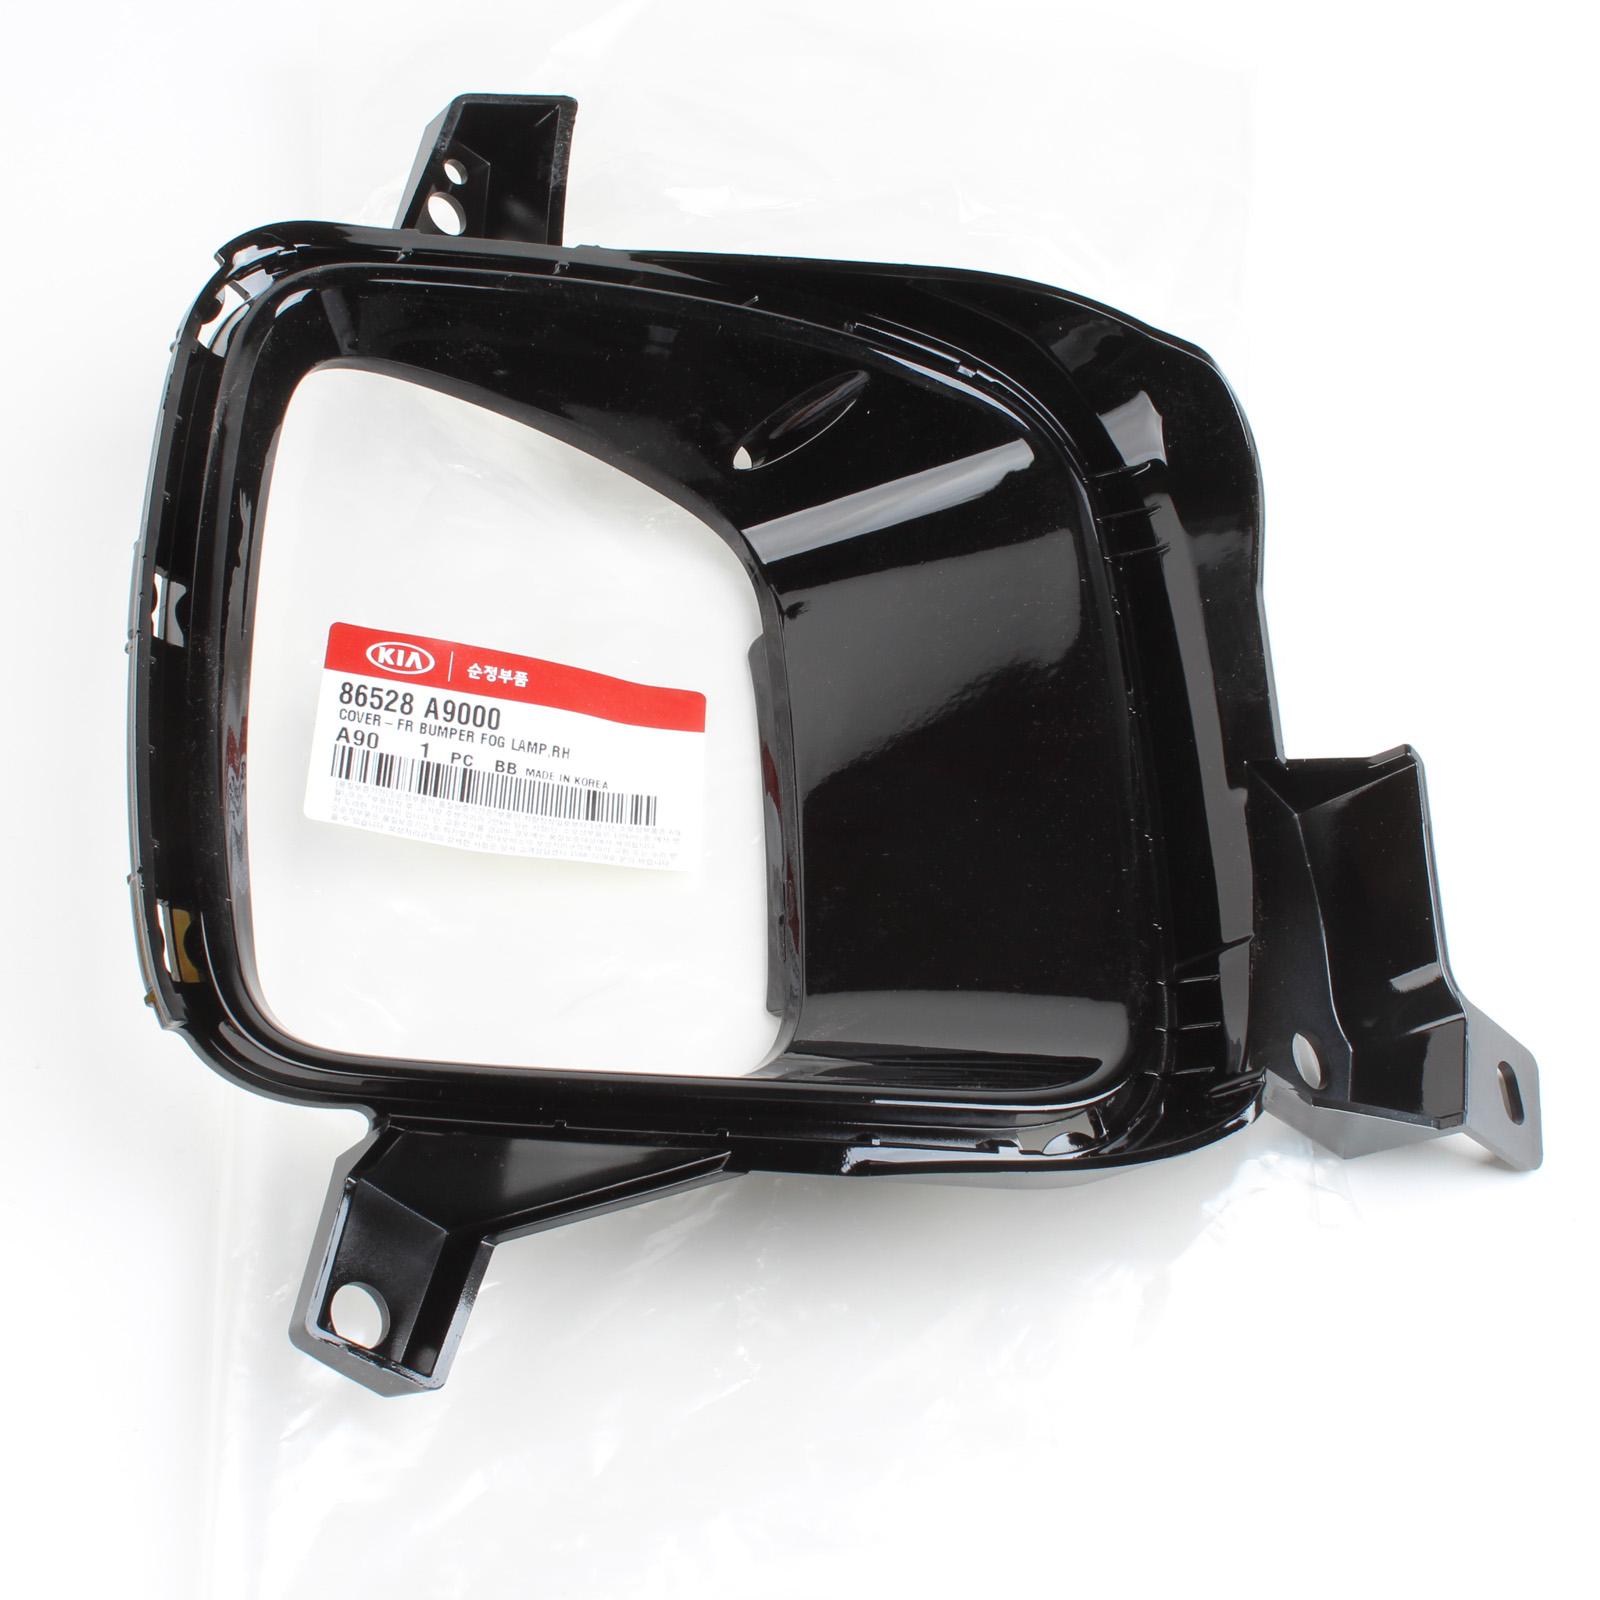 Genuine OEM Kia Fog Light LH for 2015-2017 Sedona